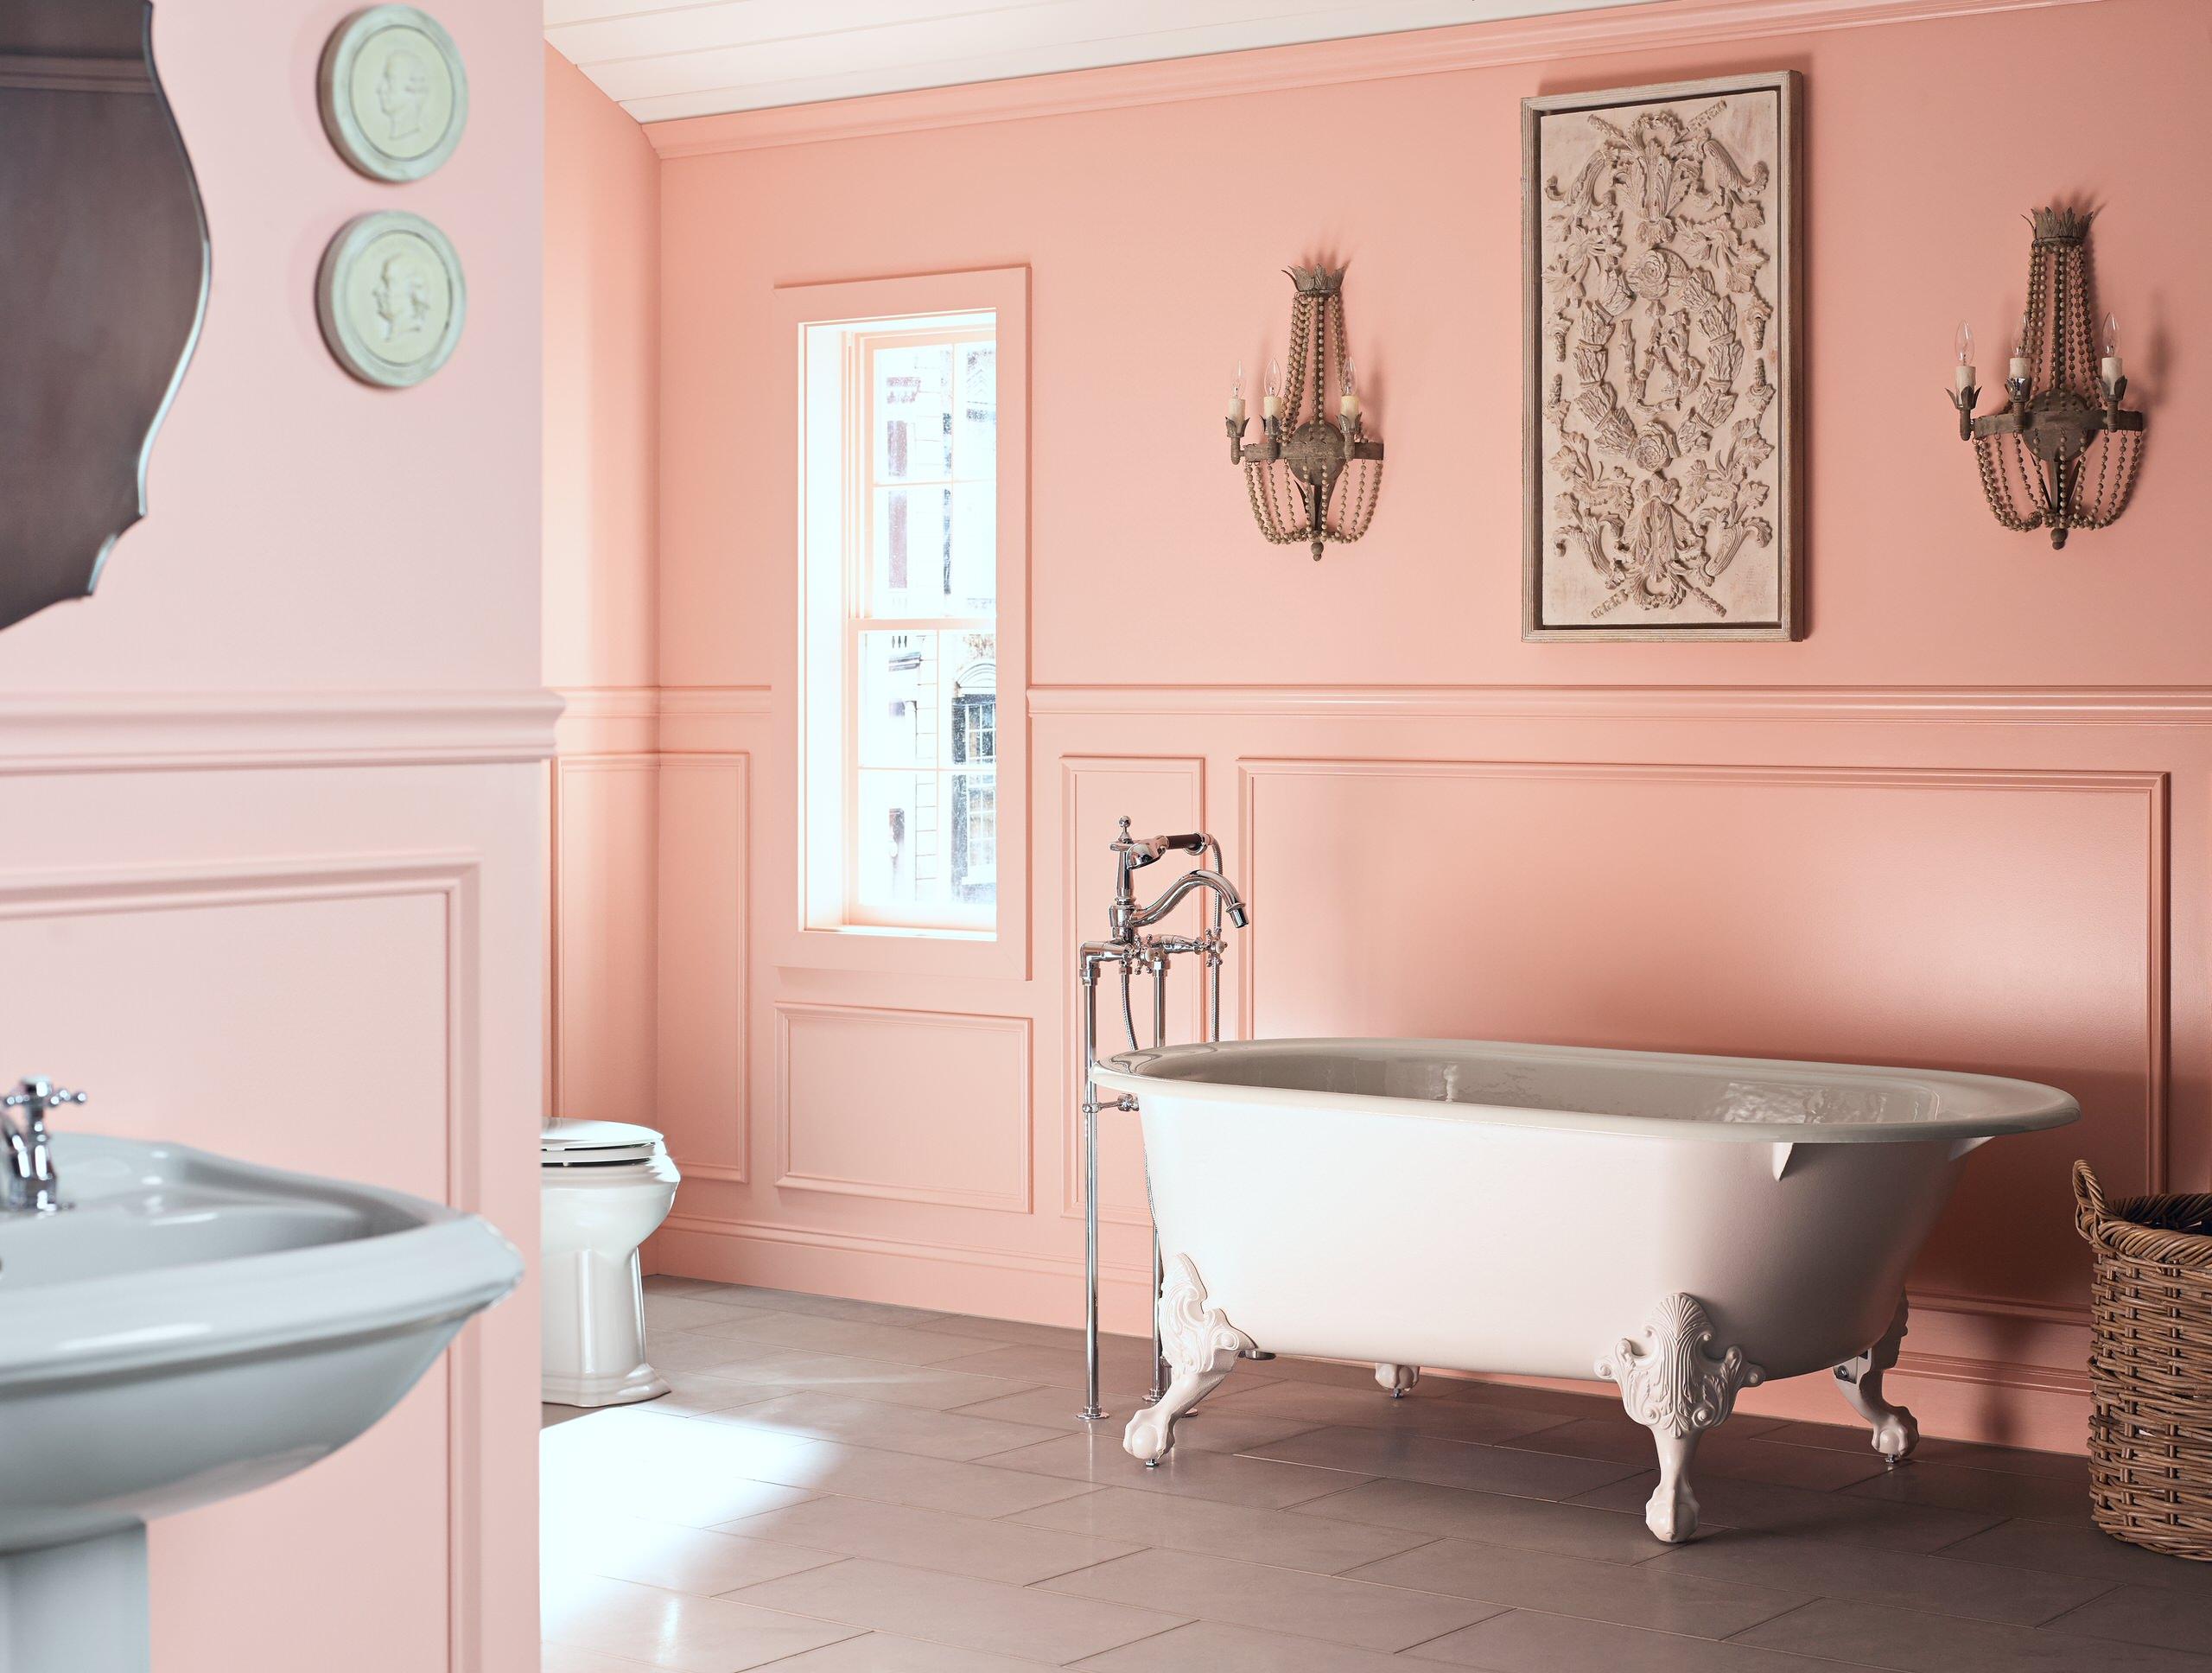 pink bathroom with a pedestal sink